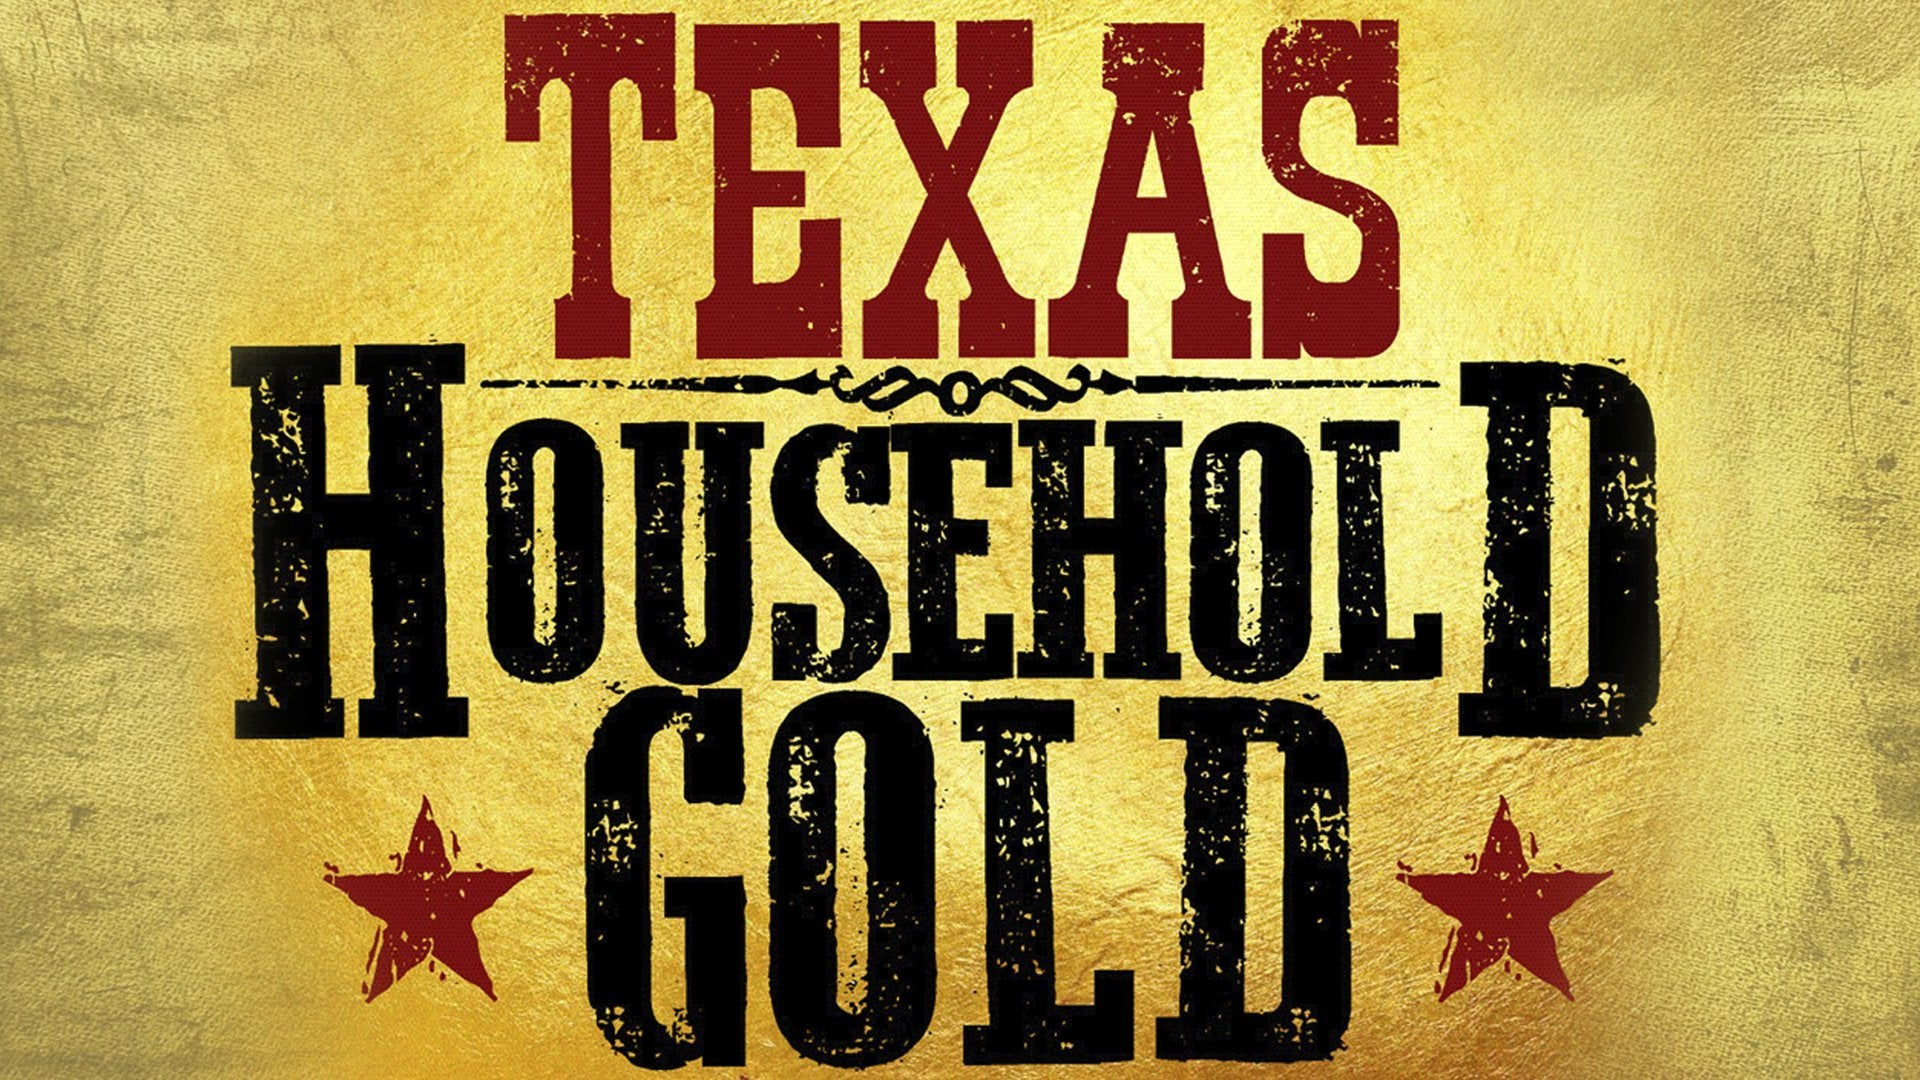 Texas Household Gold